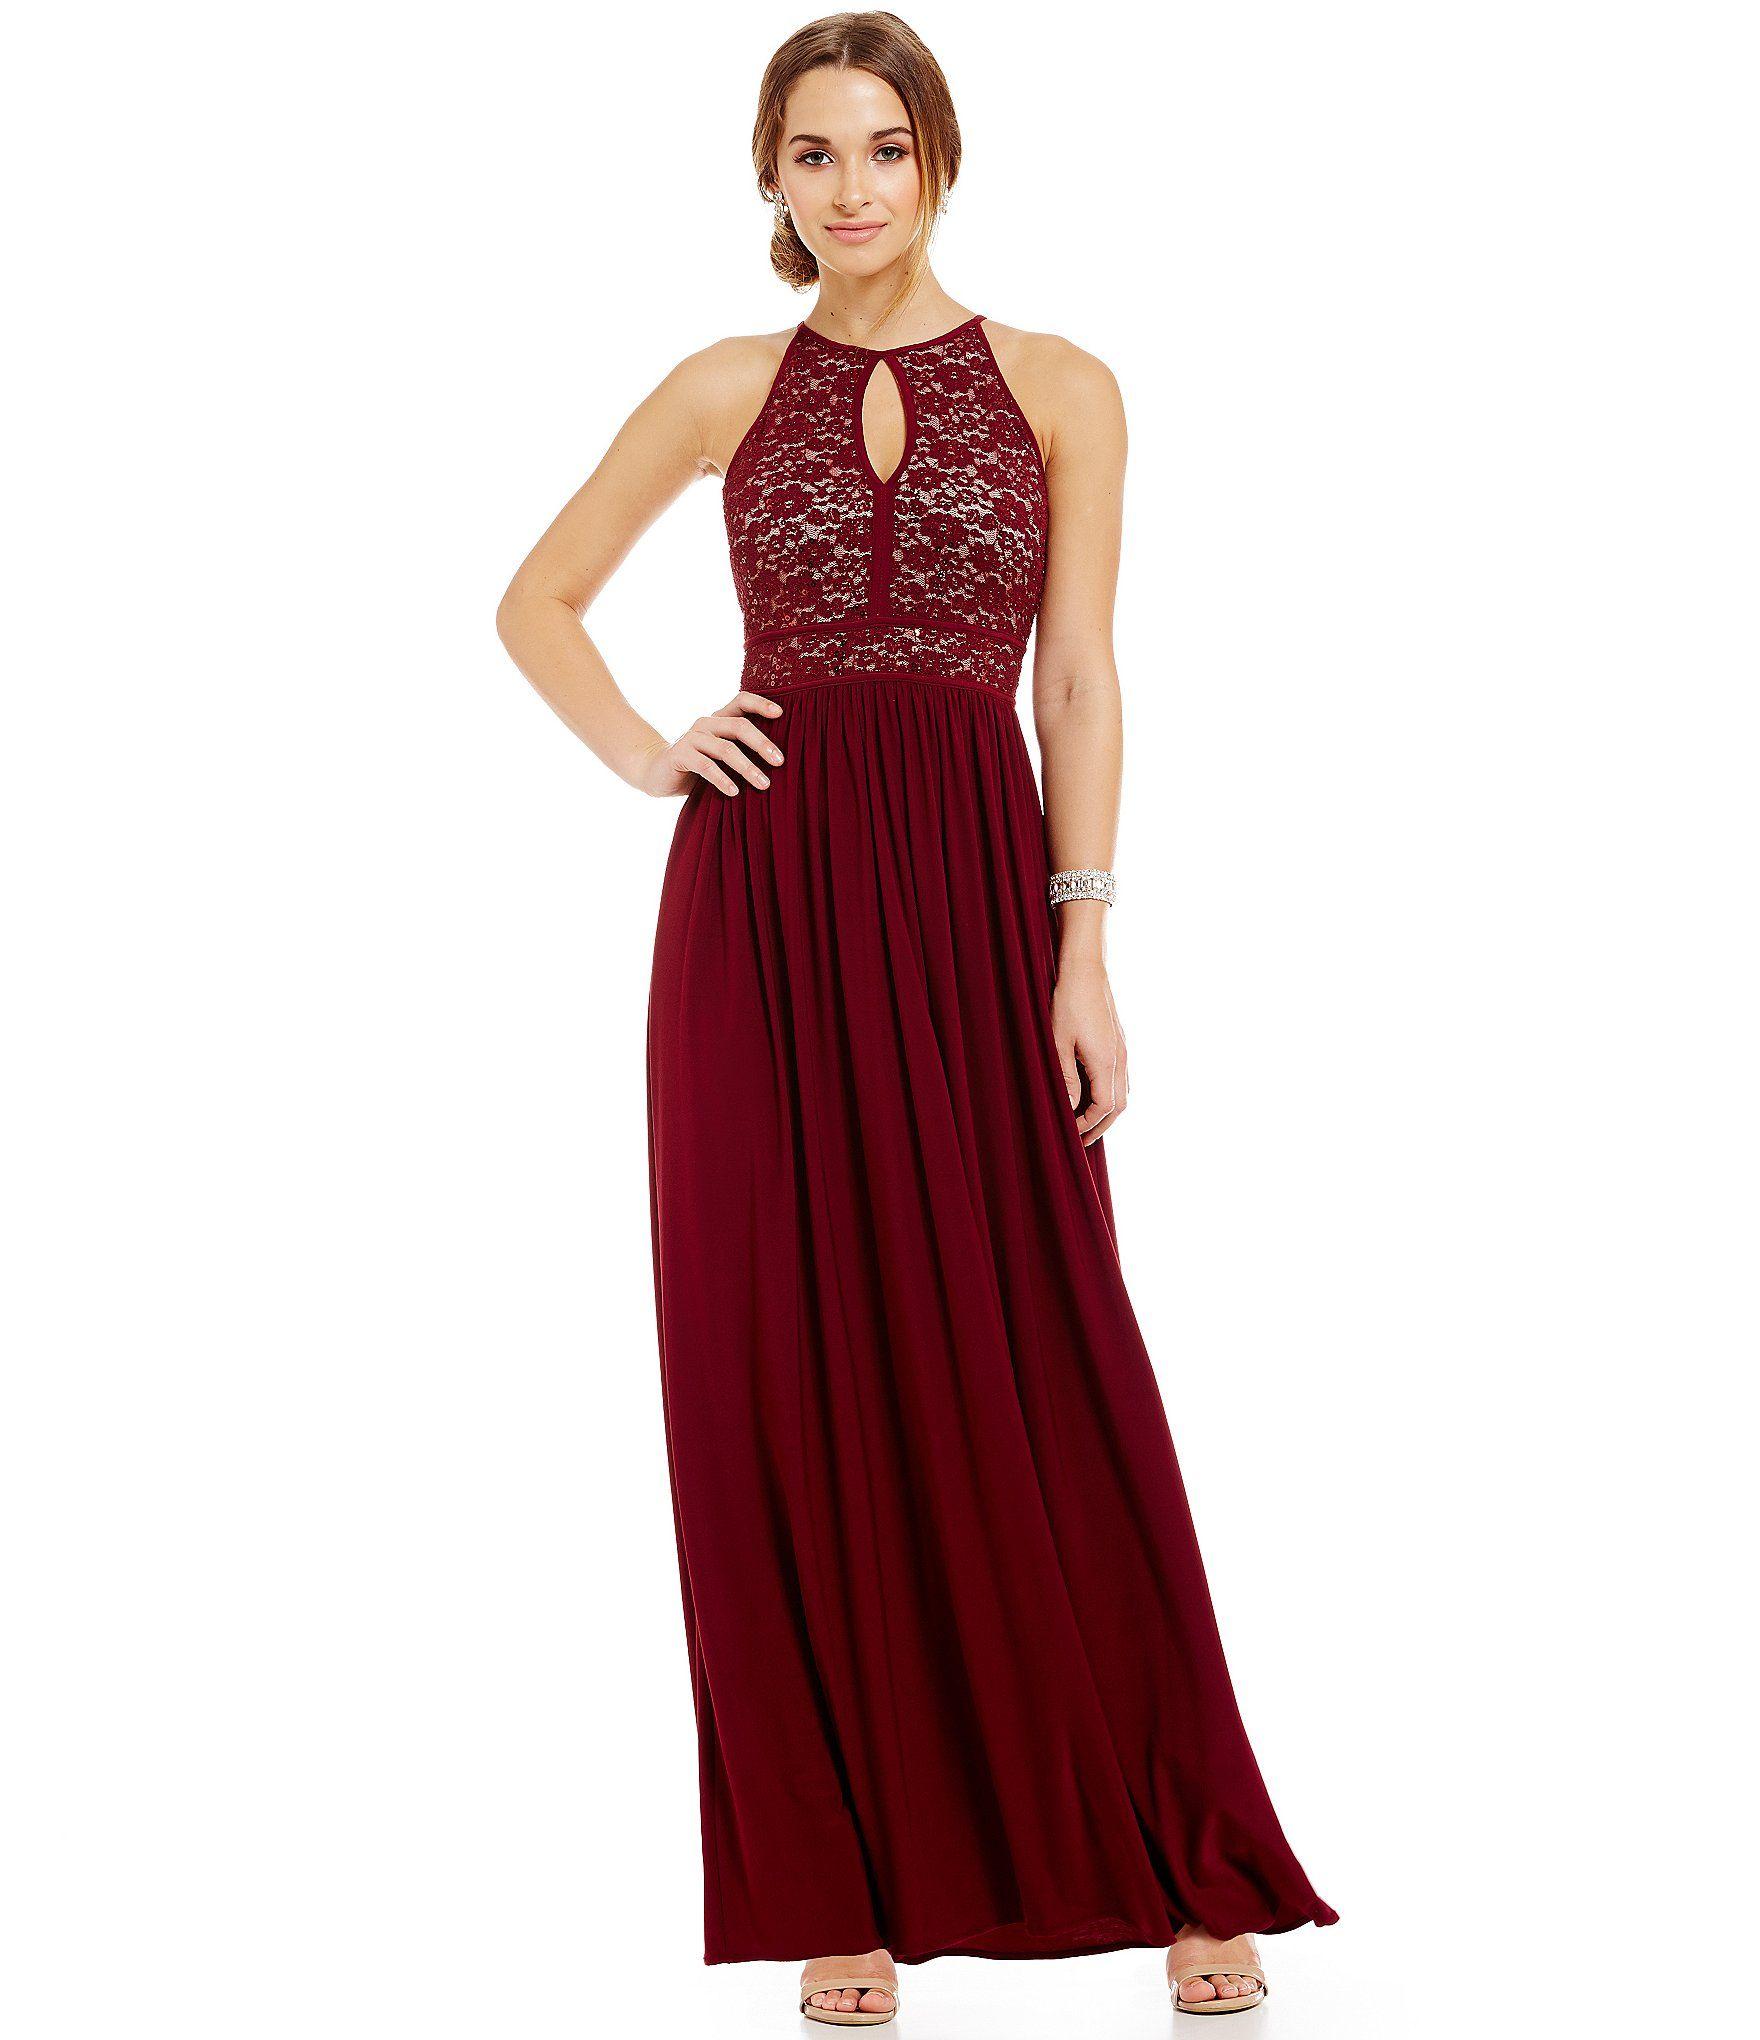 f2d5bca1e2f Dillards Plus Size Junior Dresses